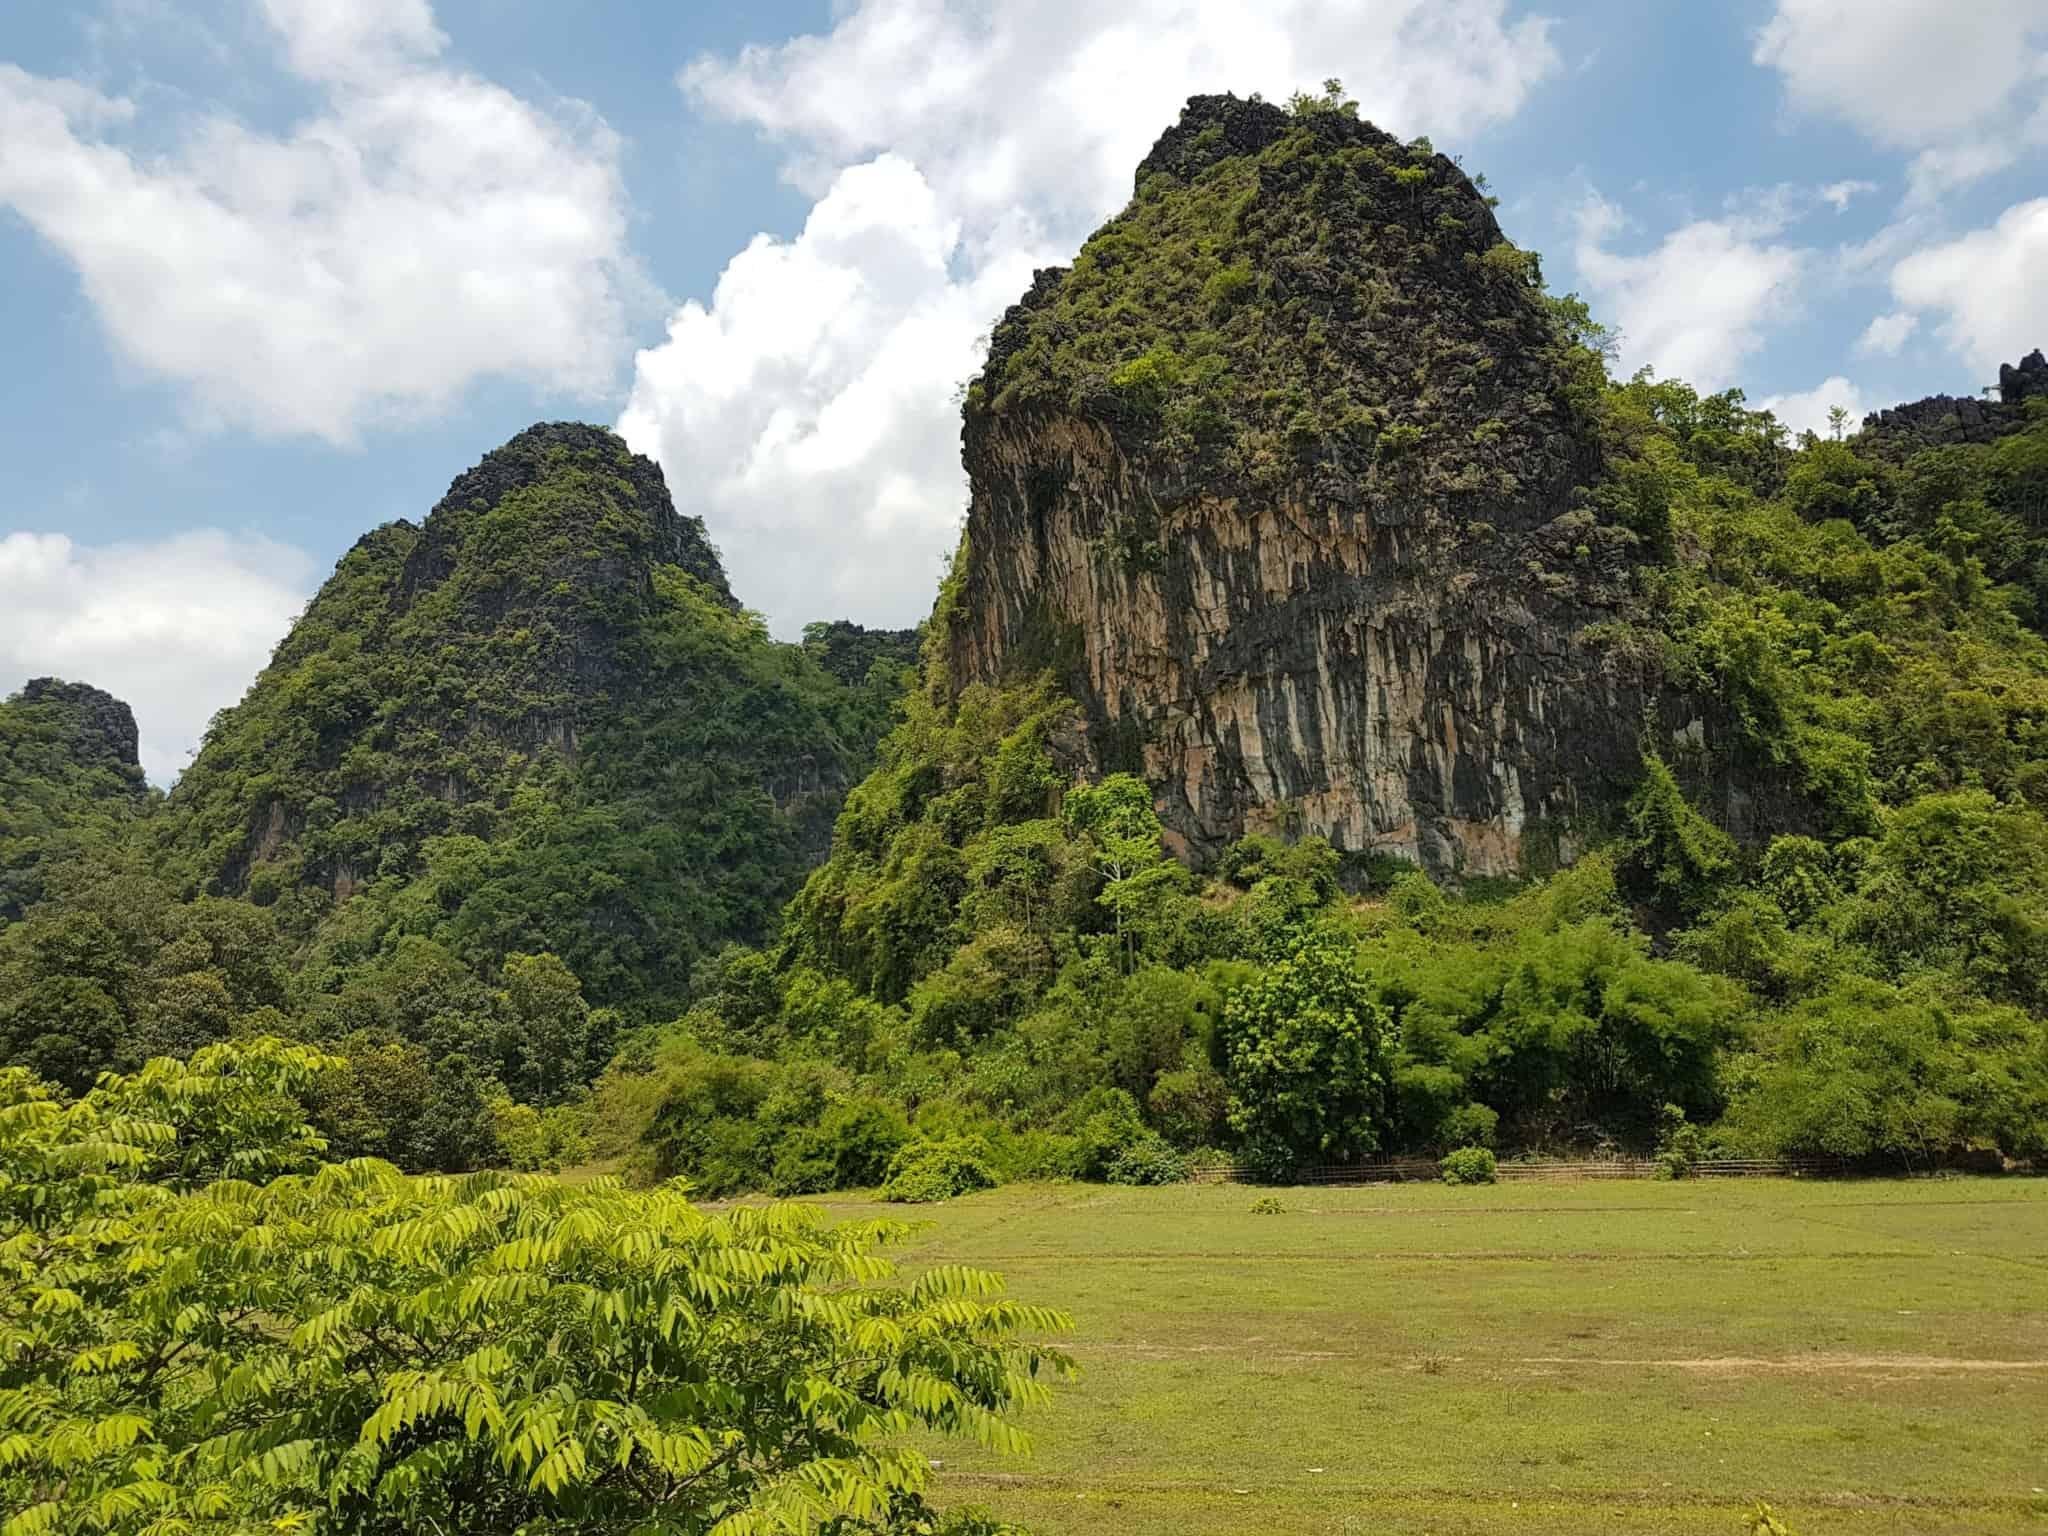 Laos, la boucle de Thakhek à moto 🛵 4